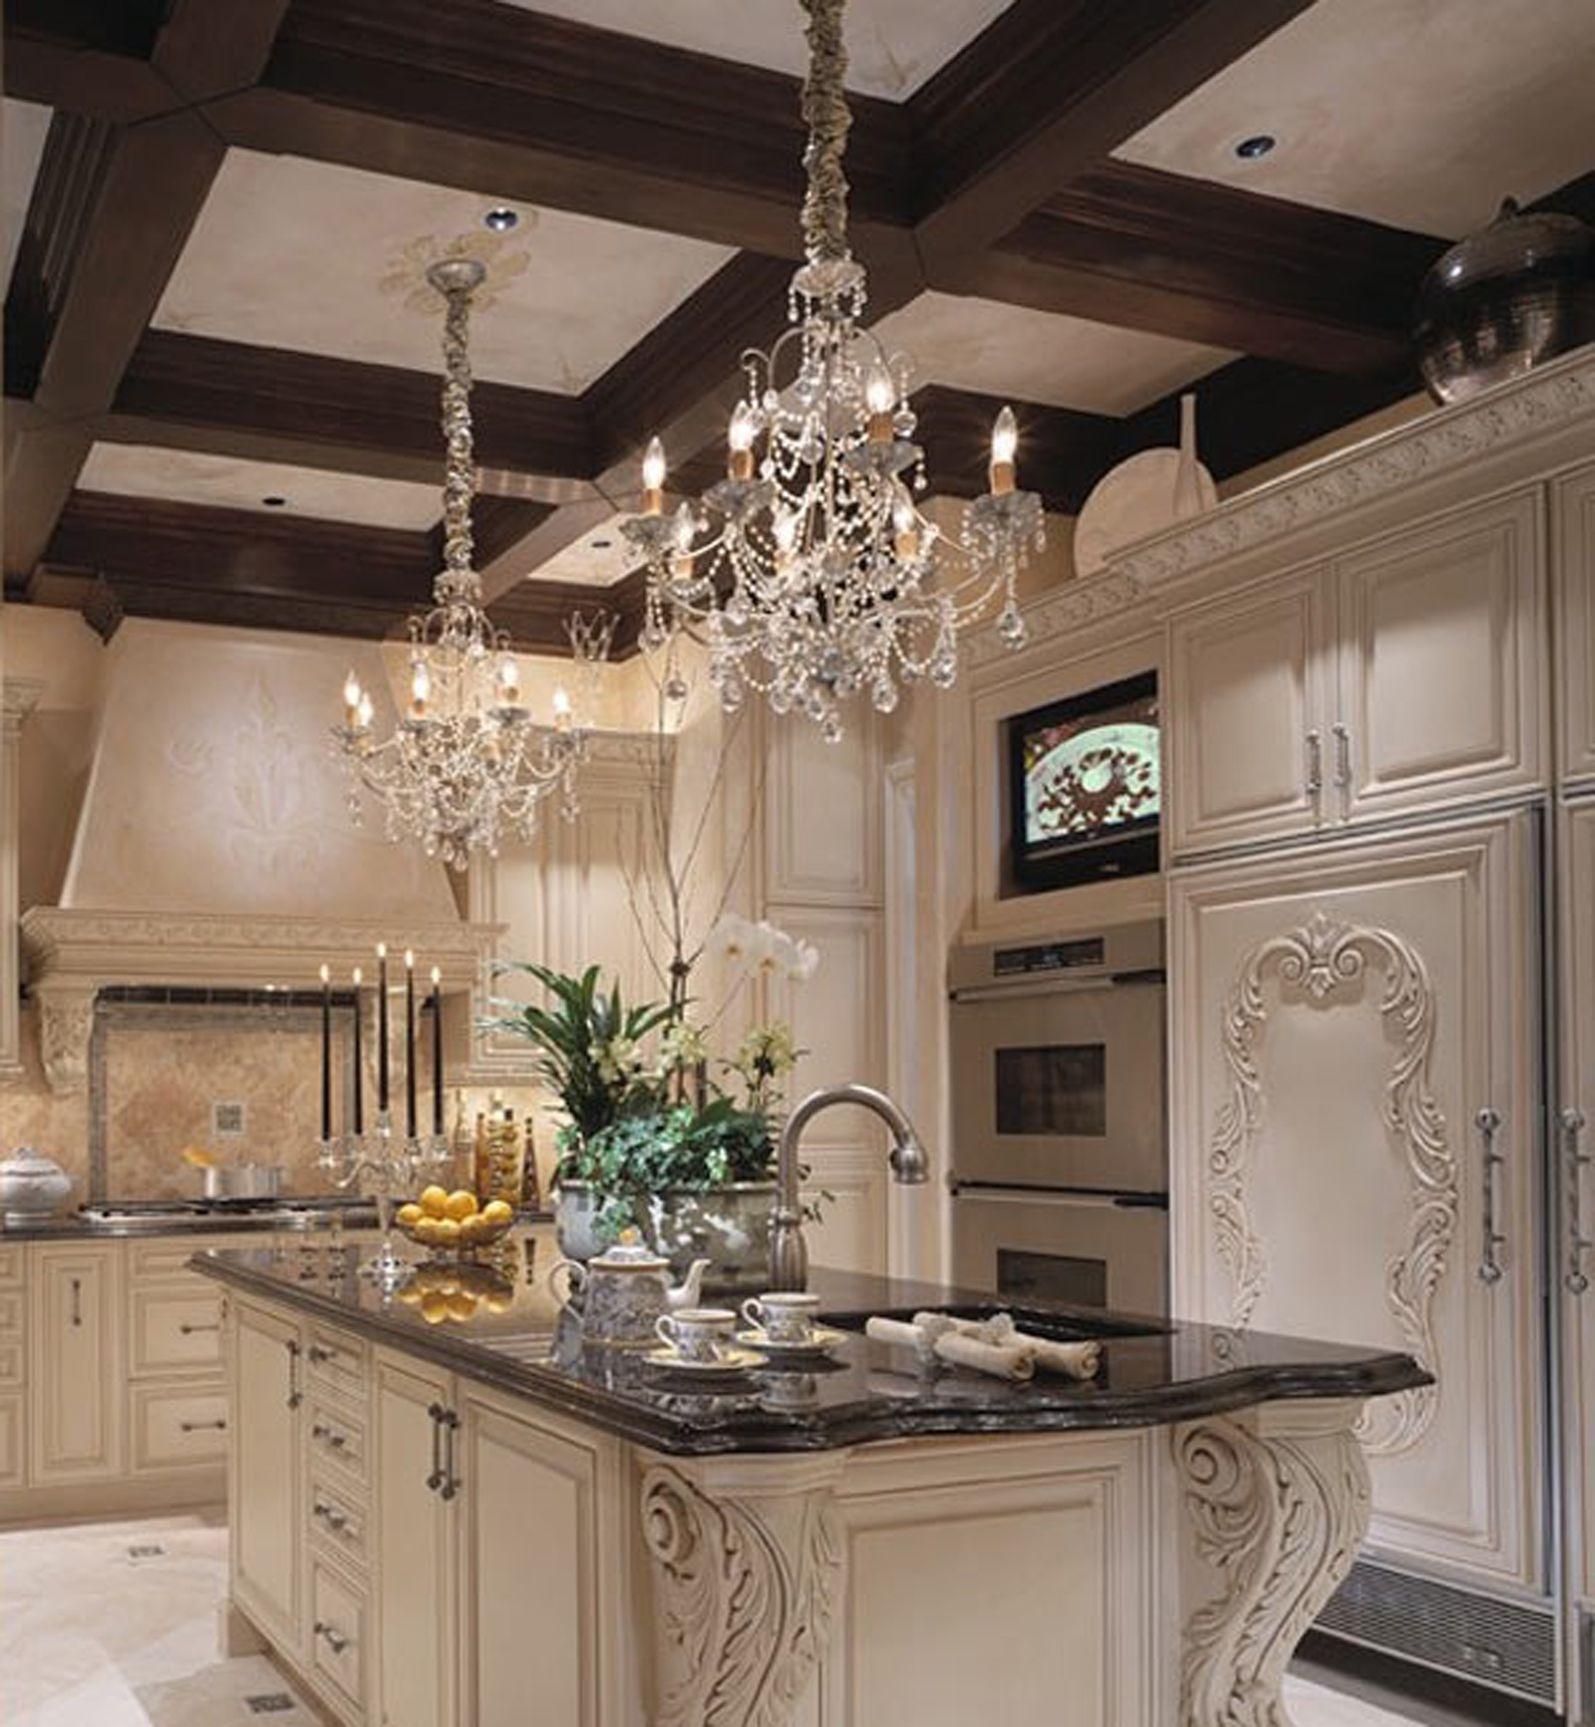 101 Custom Kitchen Design Ideas (Pictures)